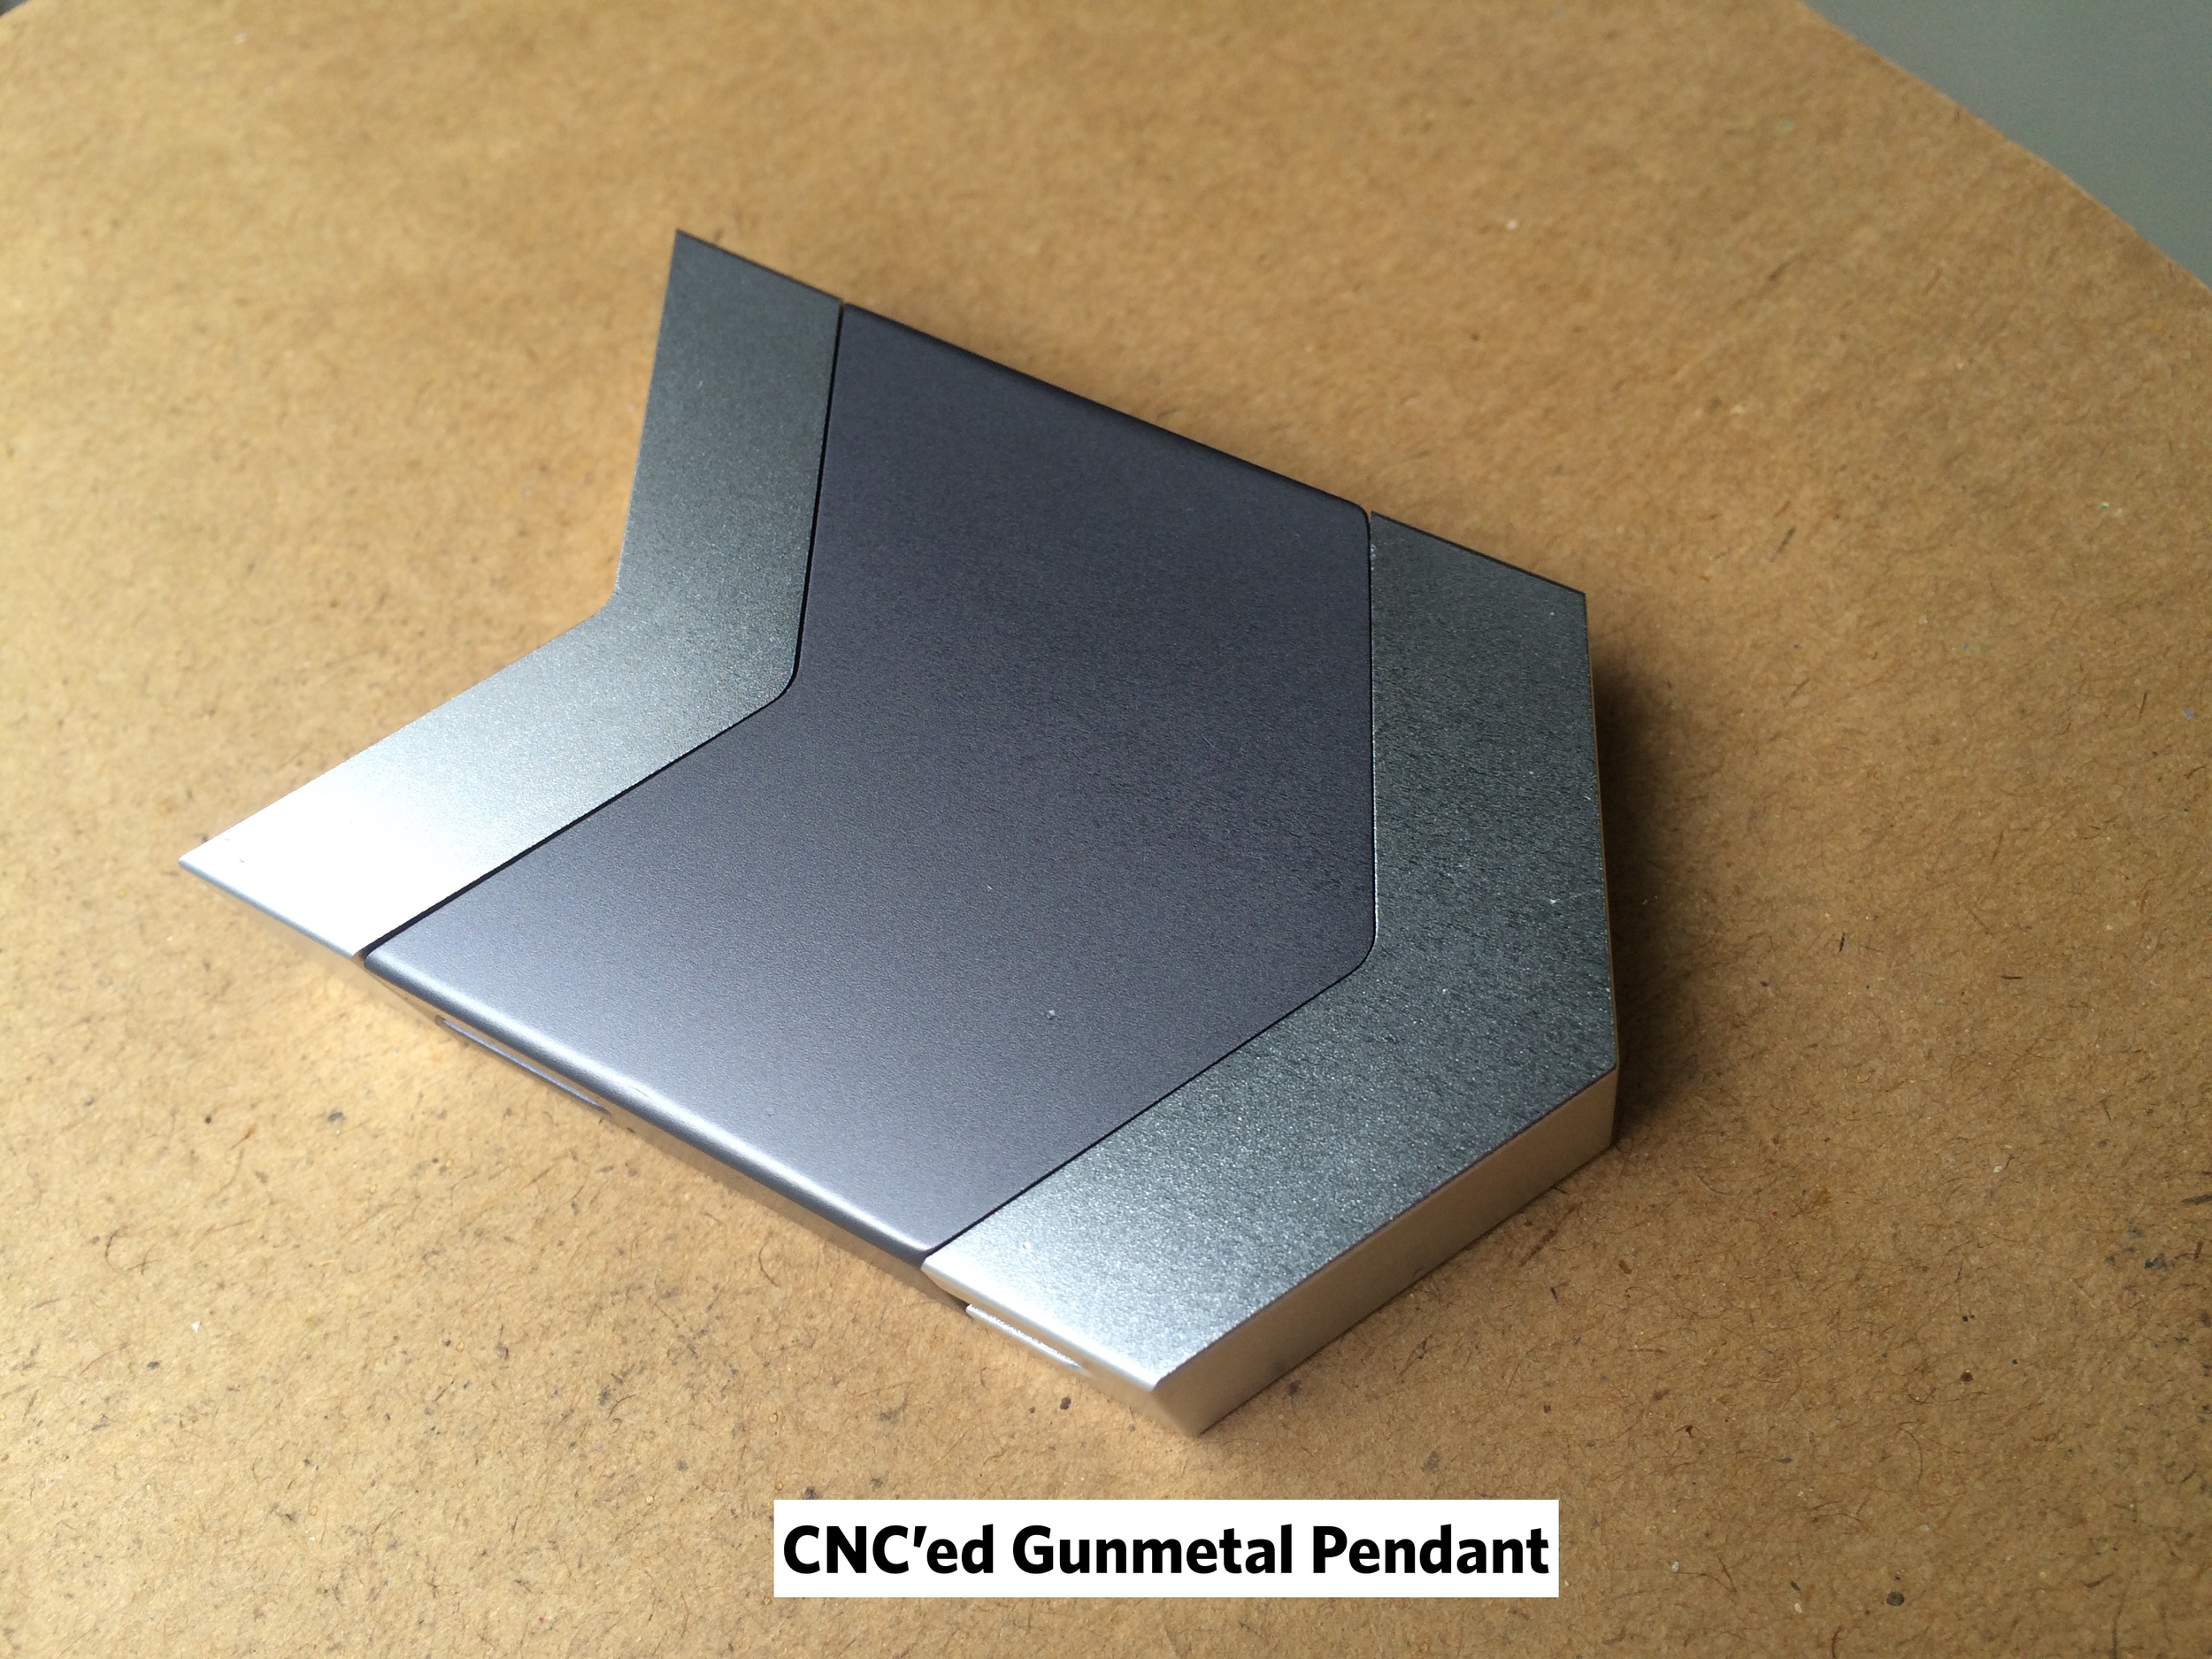 Tinsel- Dipper Audio Necklace: CNC Gunmetal Pendant, tinsel.me